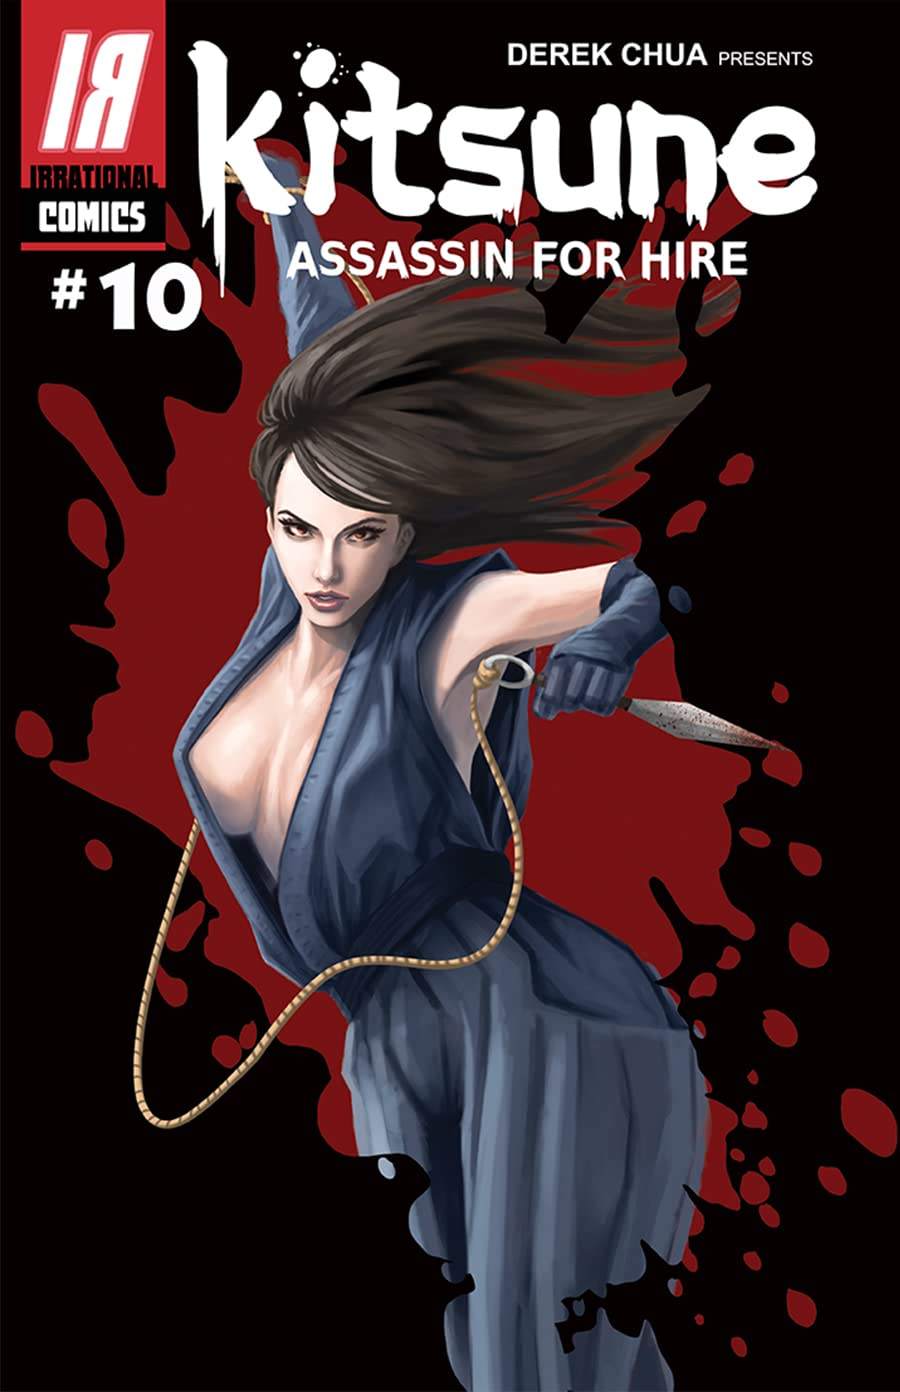 Kitsune: Assassin For Hire #10